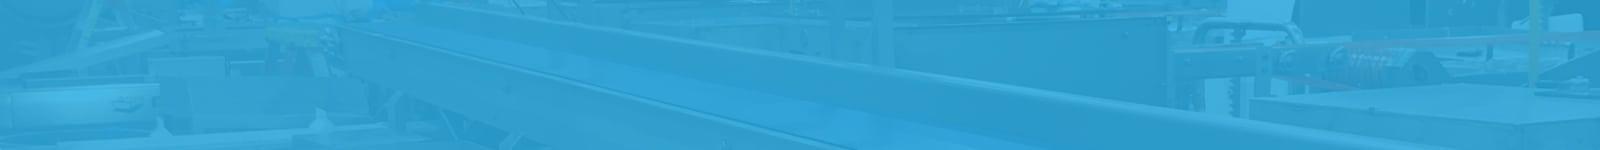 standard sanitary conveyors